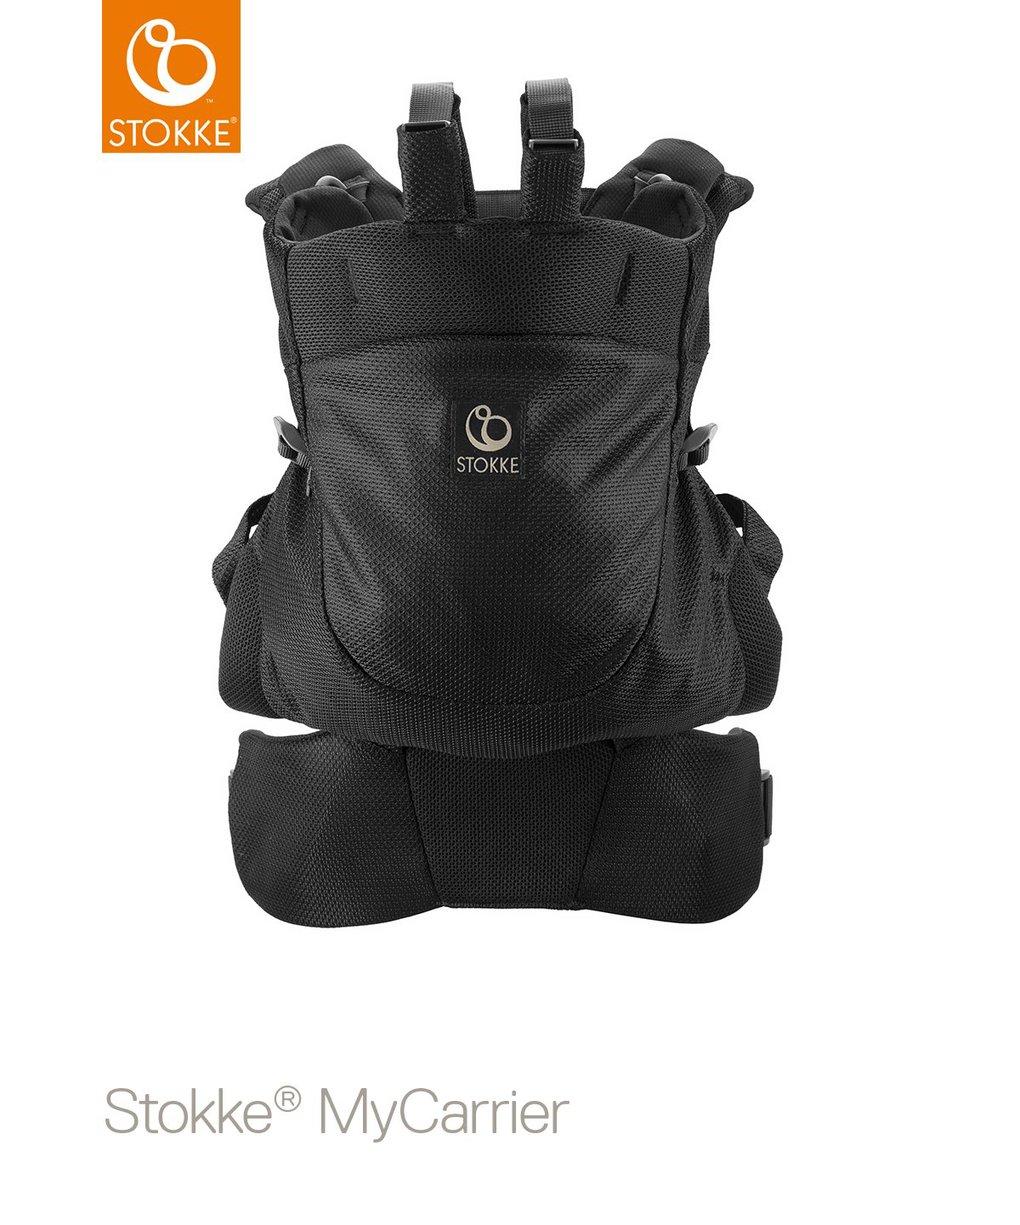 Suporte frontal e traseiro stokke® mycarrier ™ - preto - Stokke